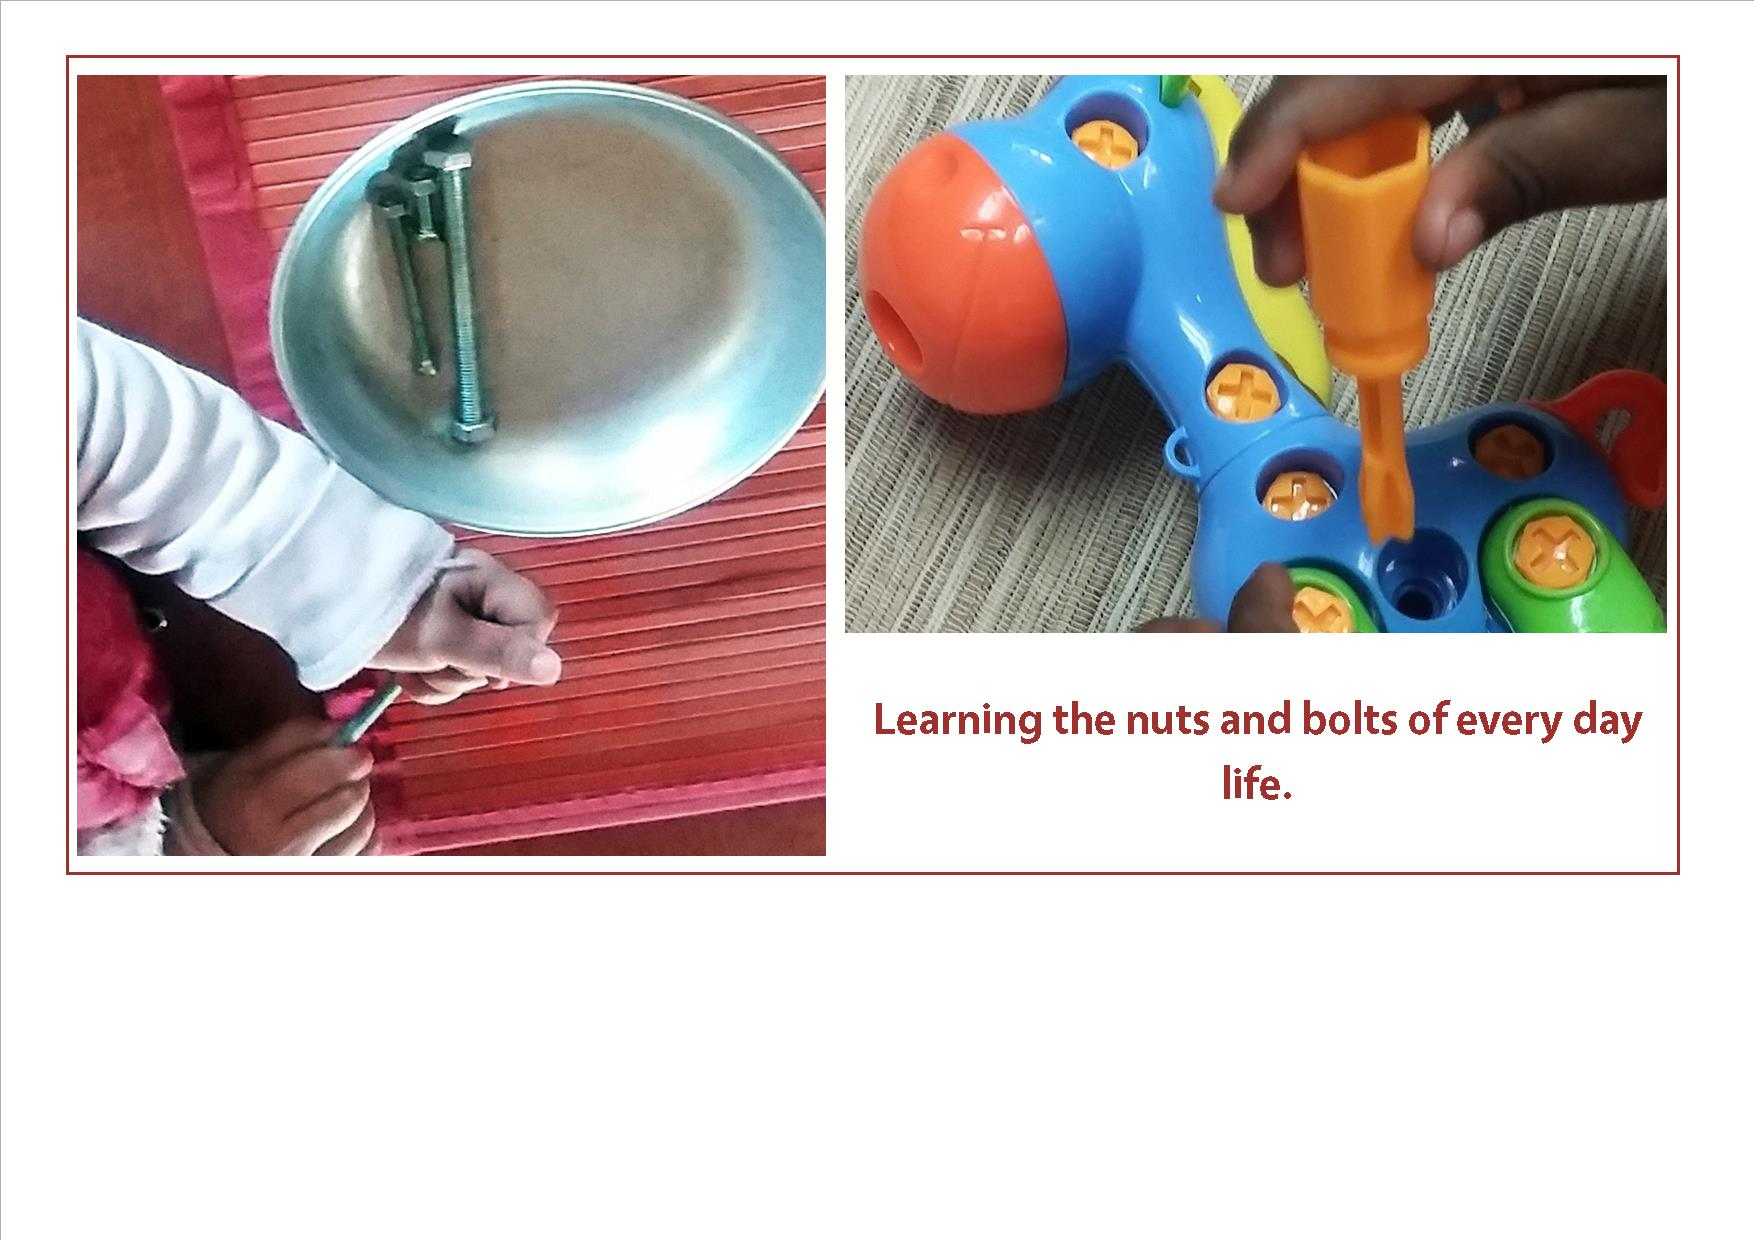 Preschool near you in Pretoria East Montessori learning everyday skills